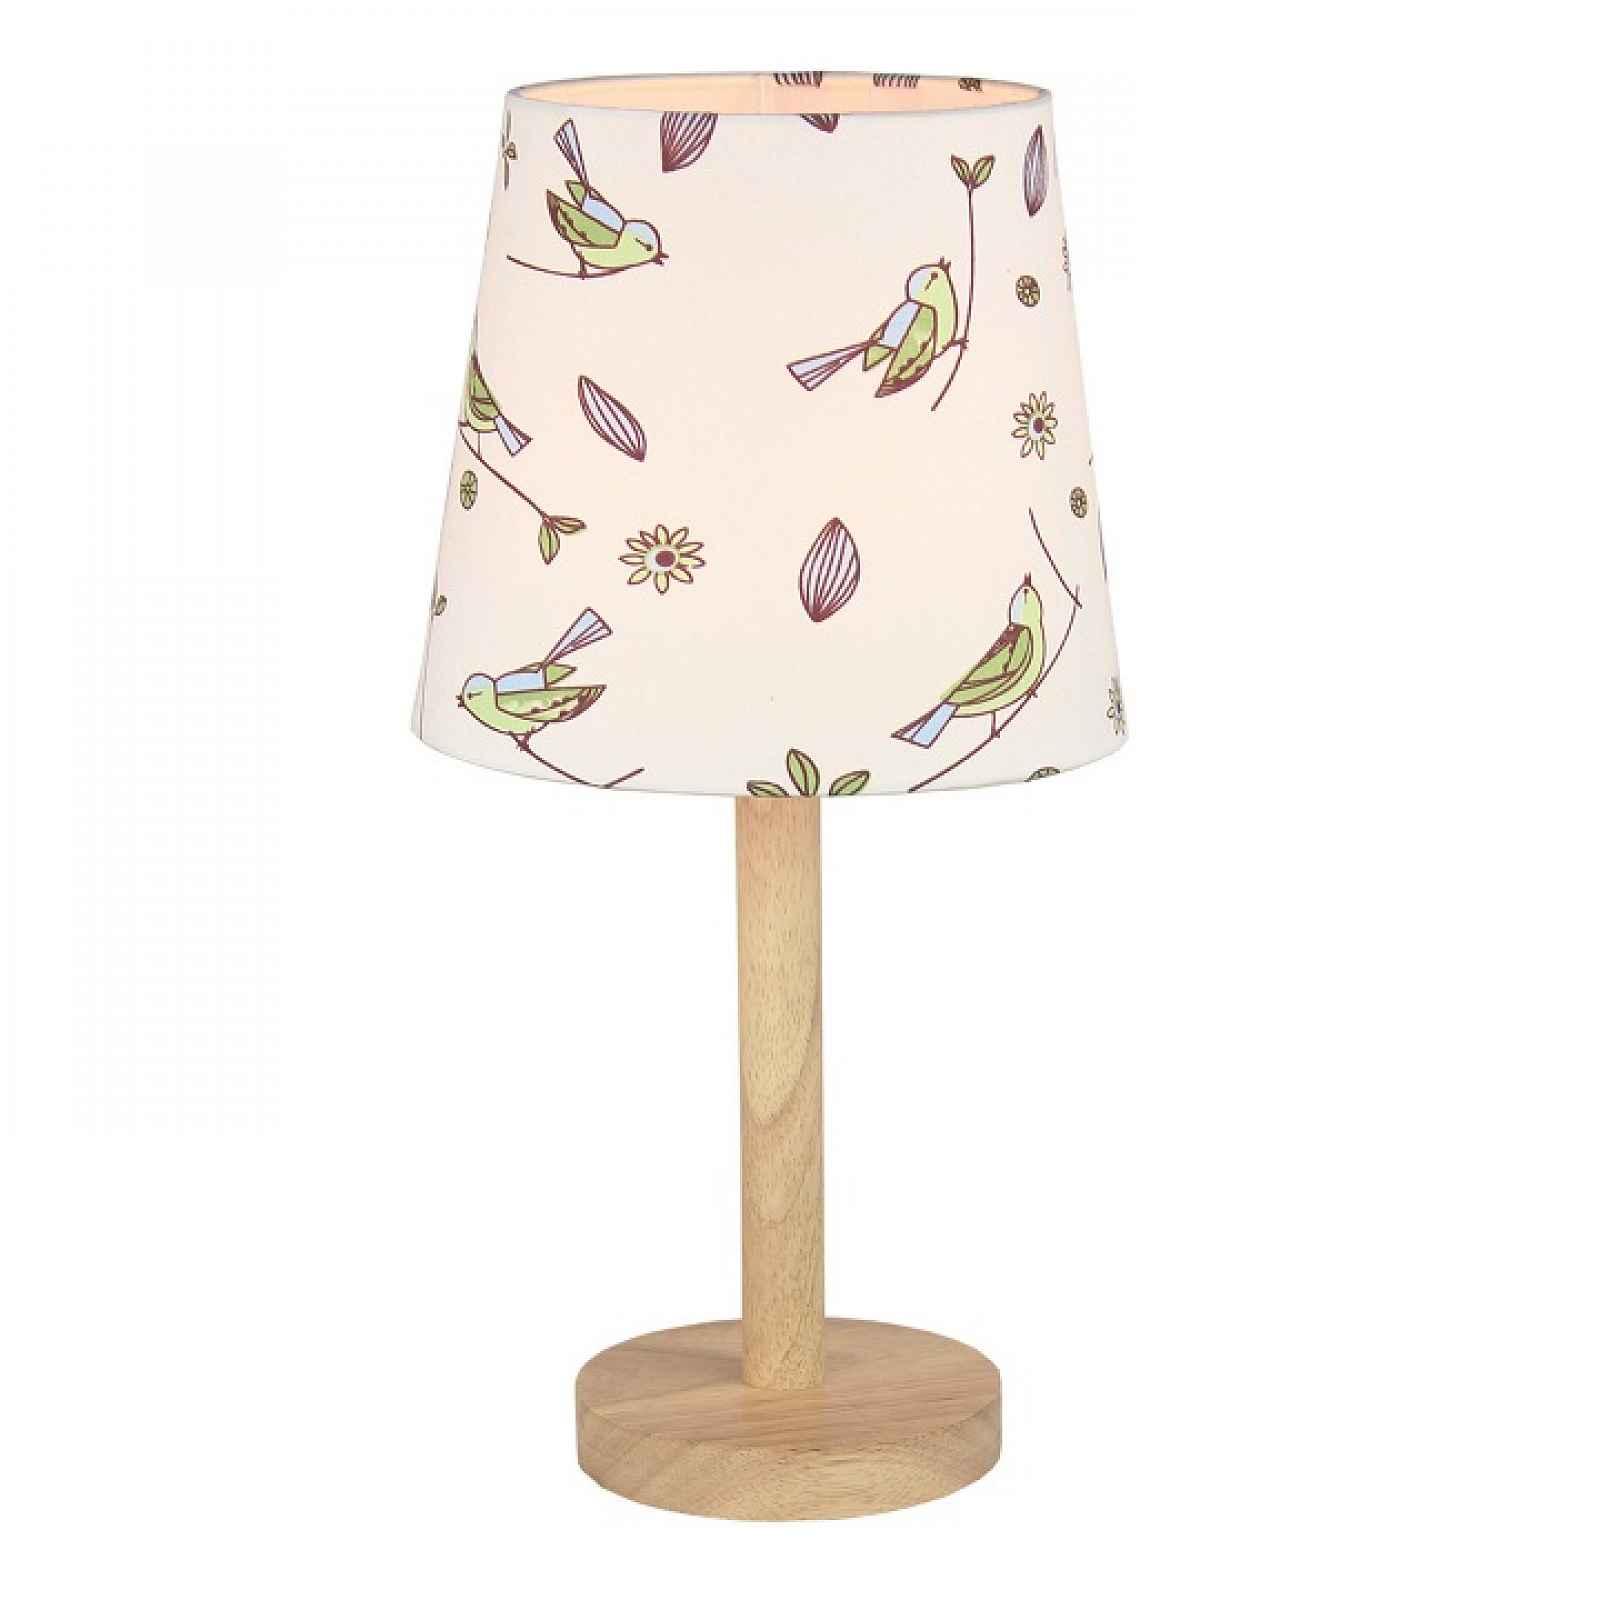 Stolní lampa, dřevo / látka vzor ptáci, QENNY TYP 7 0000190747 Tempo Kondela